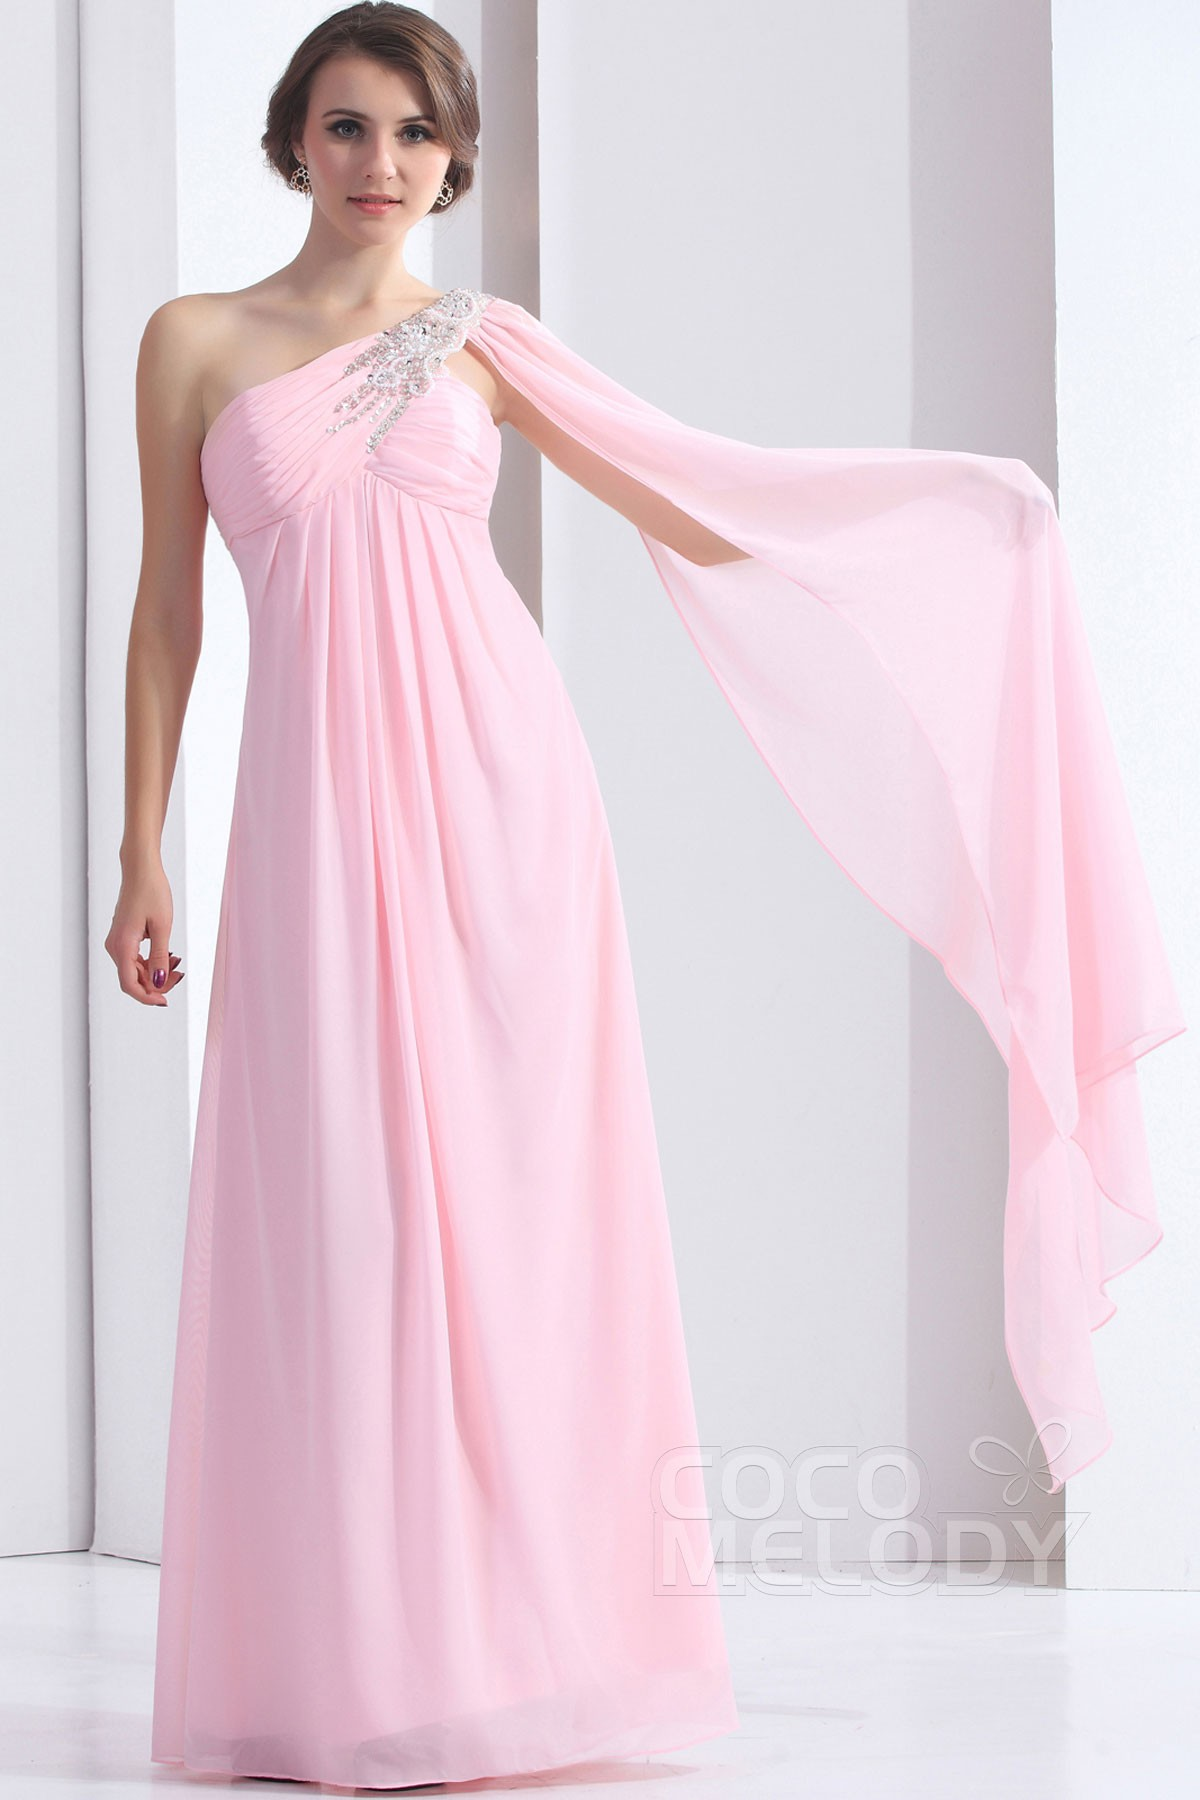 b56003b66 New Design Sheath-Column One Shoulder Floor Length Chiffon Bridesmaid Dress  COZF1304E